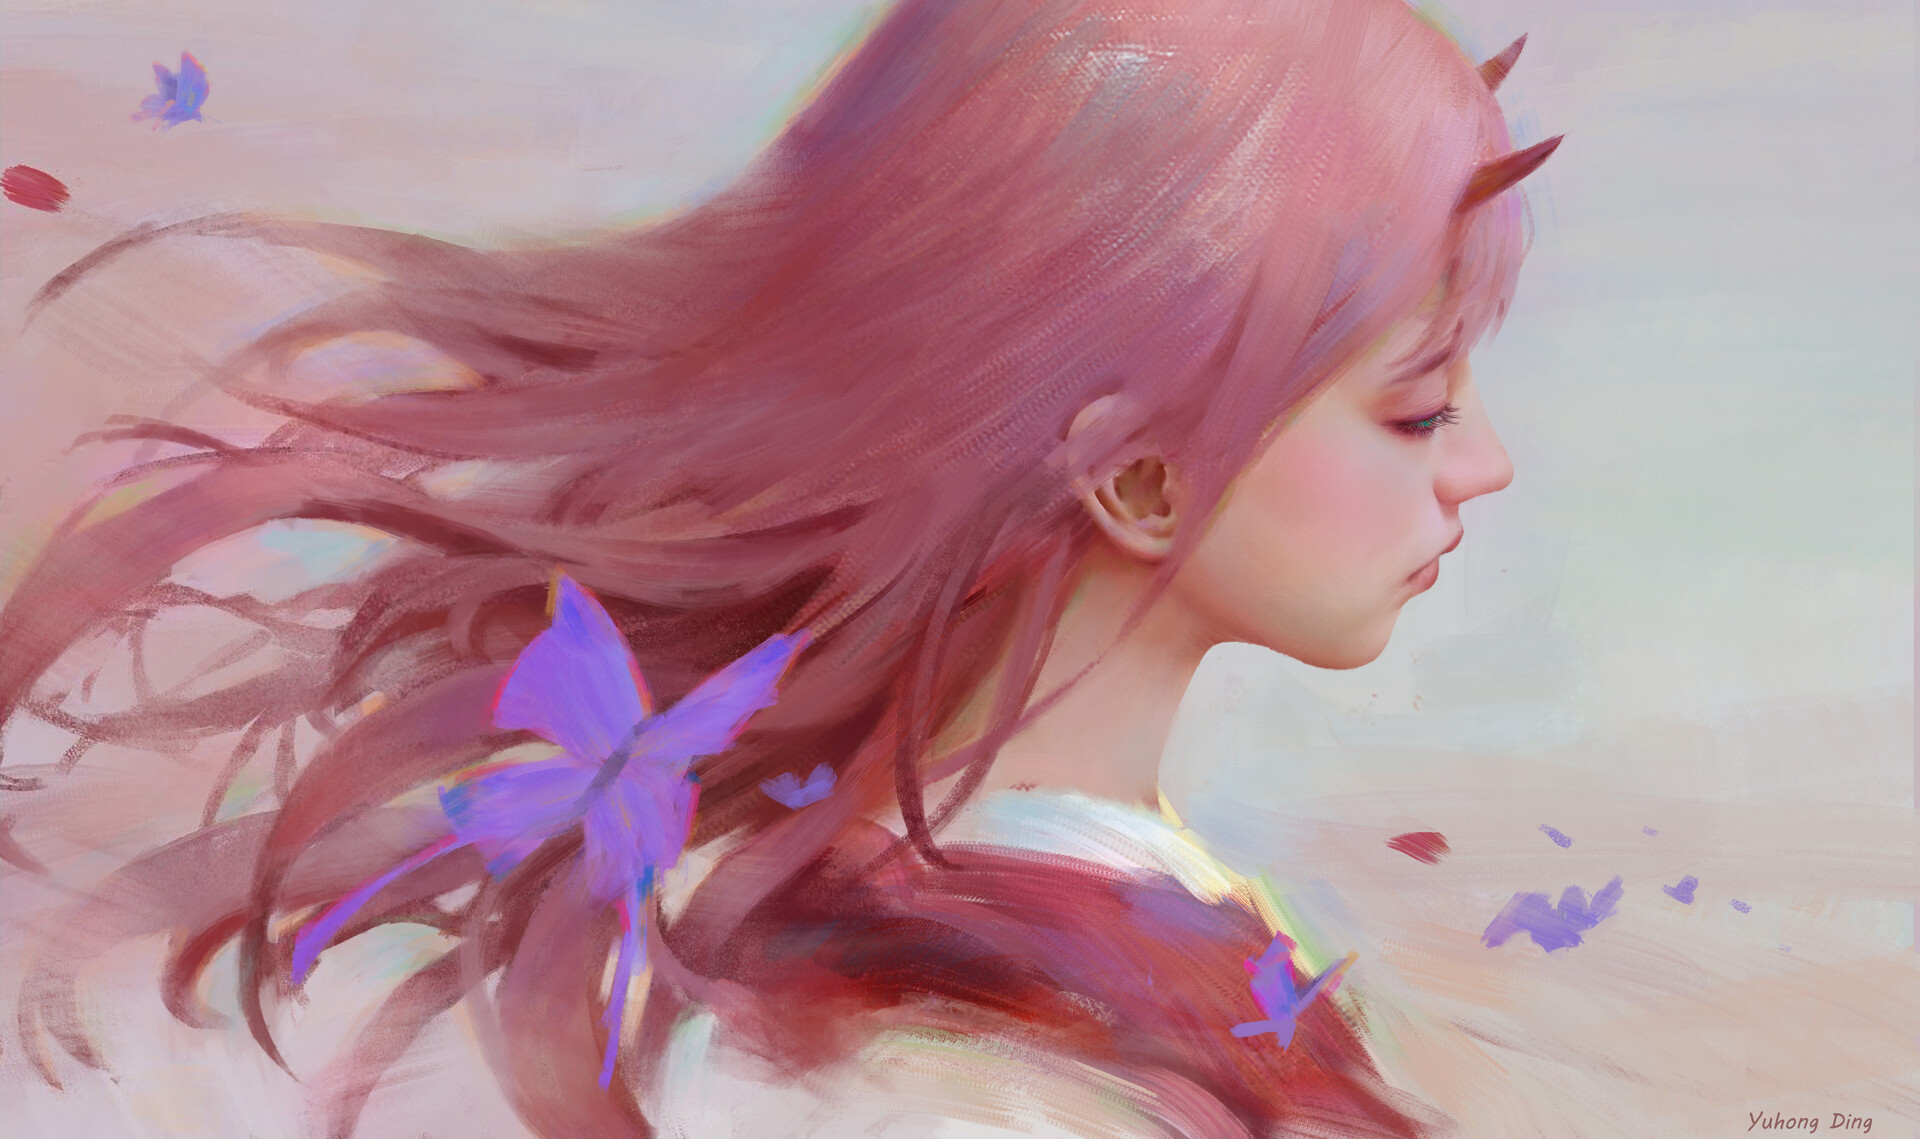 Anime 1920x1139 Zero Two (Darling in the FranXX) Darling in the FranXX anime girls pink hair long hair kimono butterfly artwork digital art horns fan art fantasy girl make up Strelizia (DARLING in the FRANXX) Code:002 fantasy art